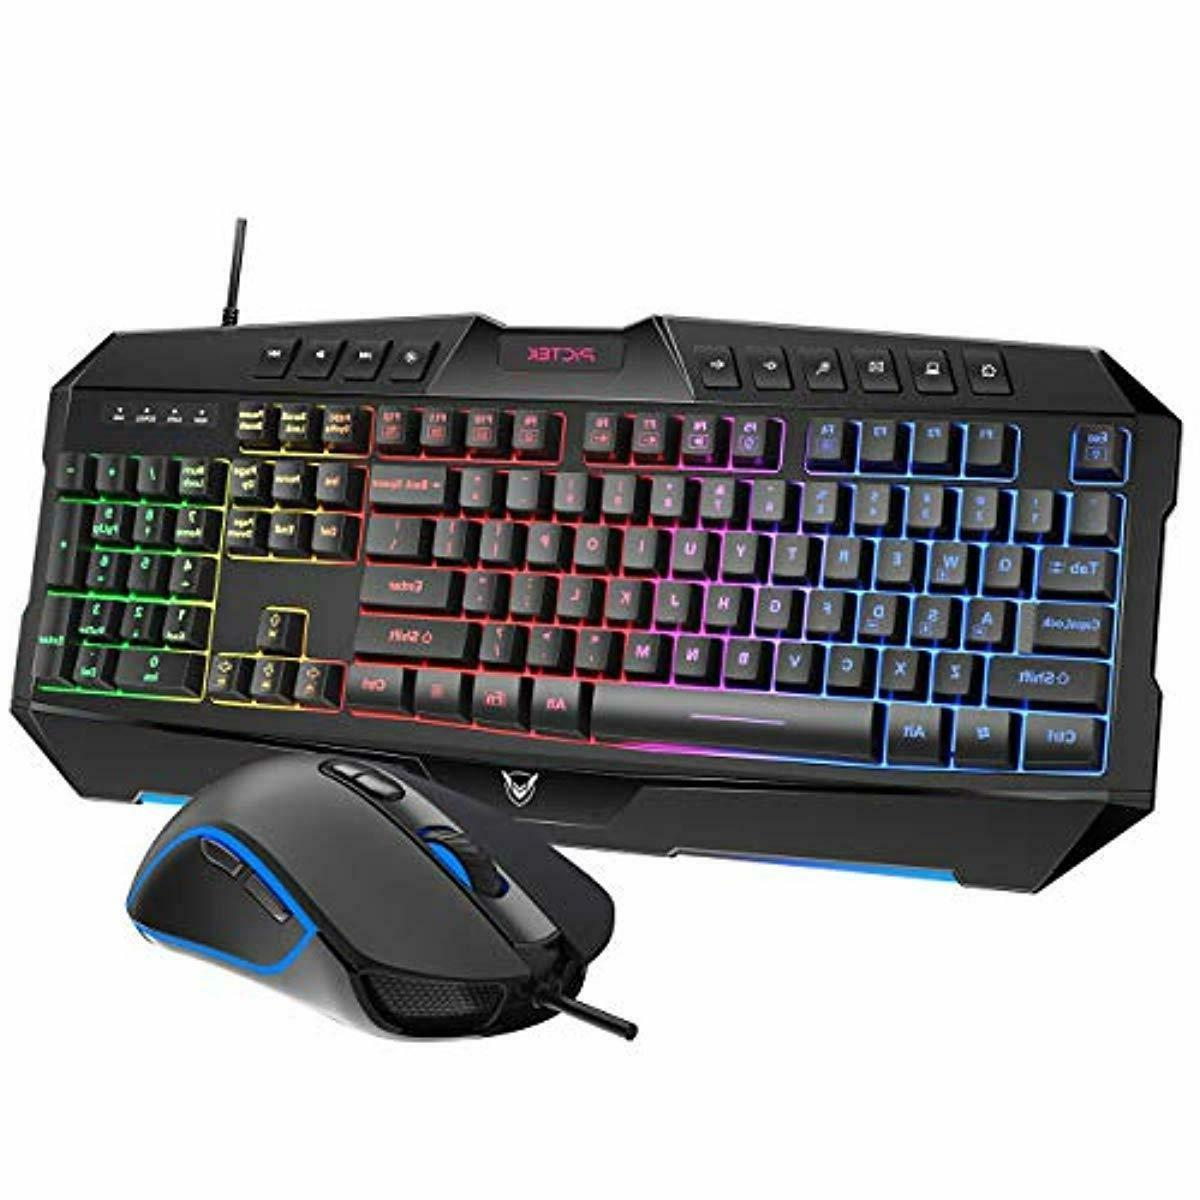 rainbow led backlit keyboard and mouse combo